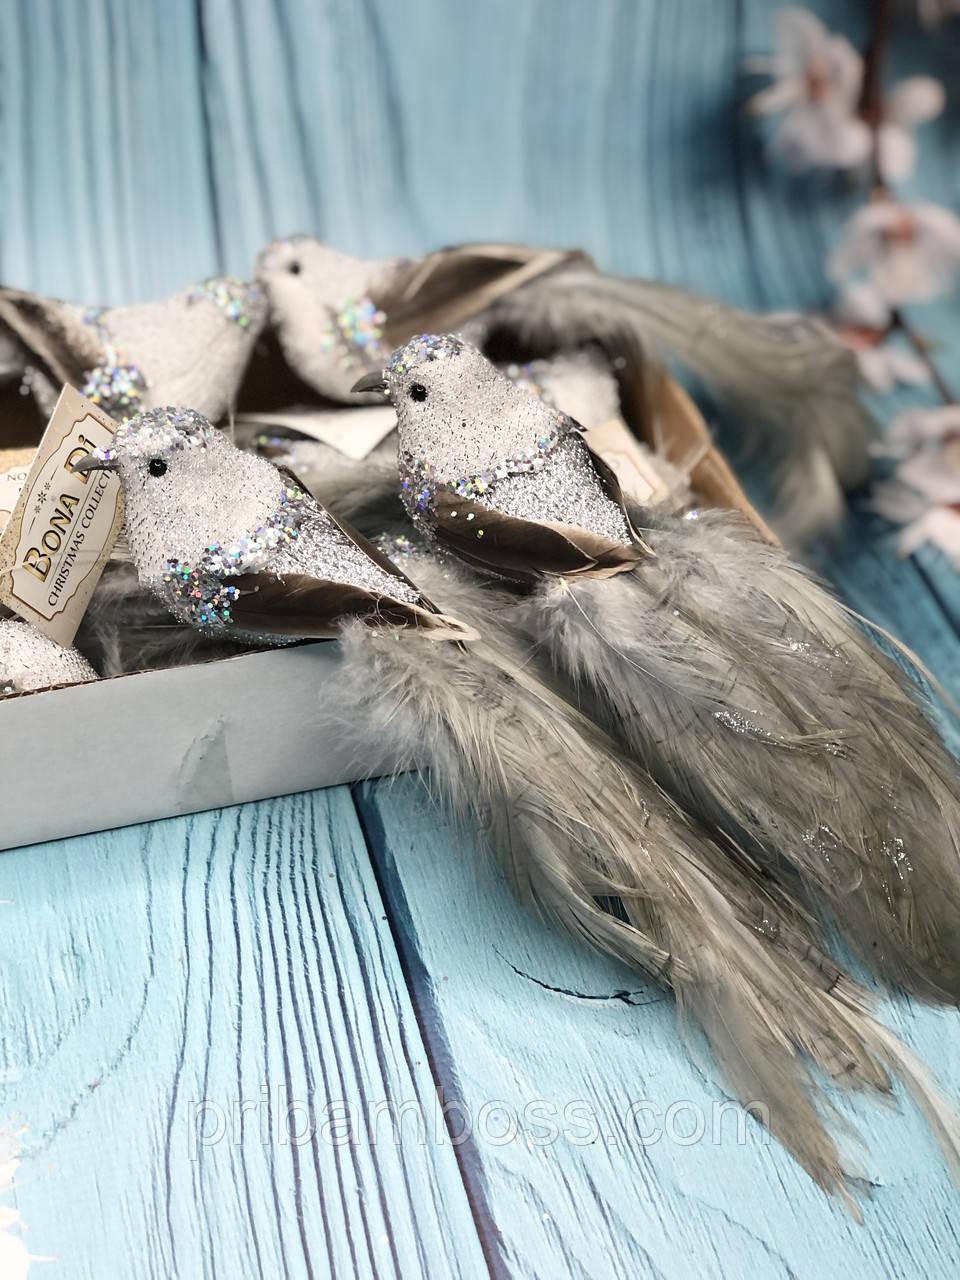 Декоративная птица на клипсе 21см, цвет - серебристо-серый 6 шт